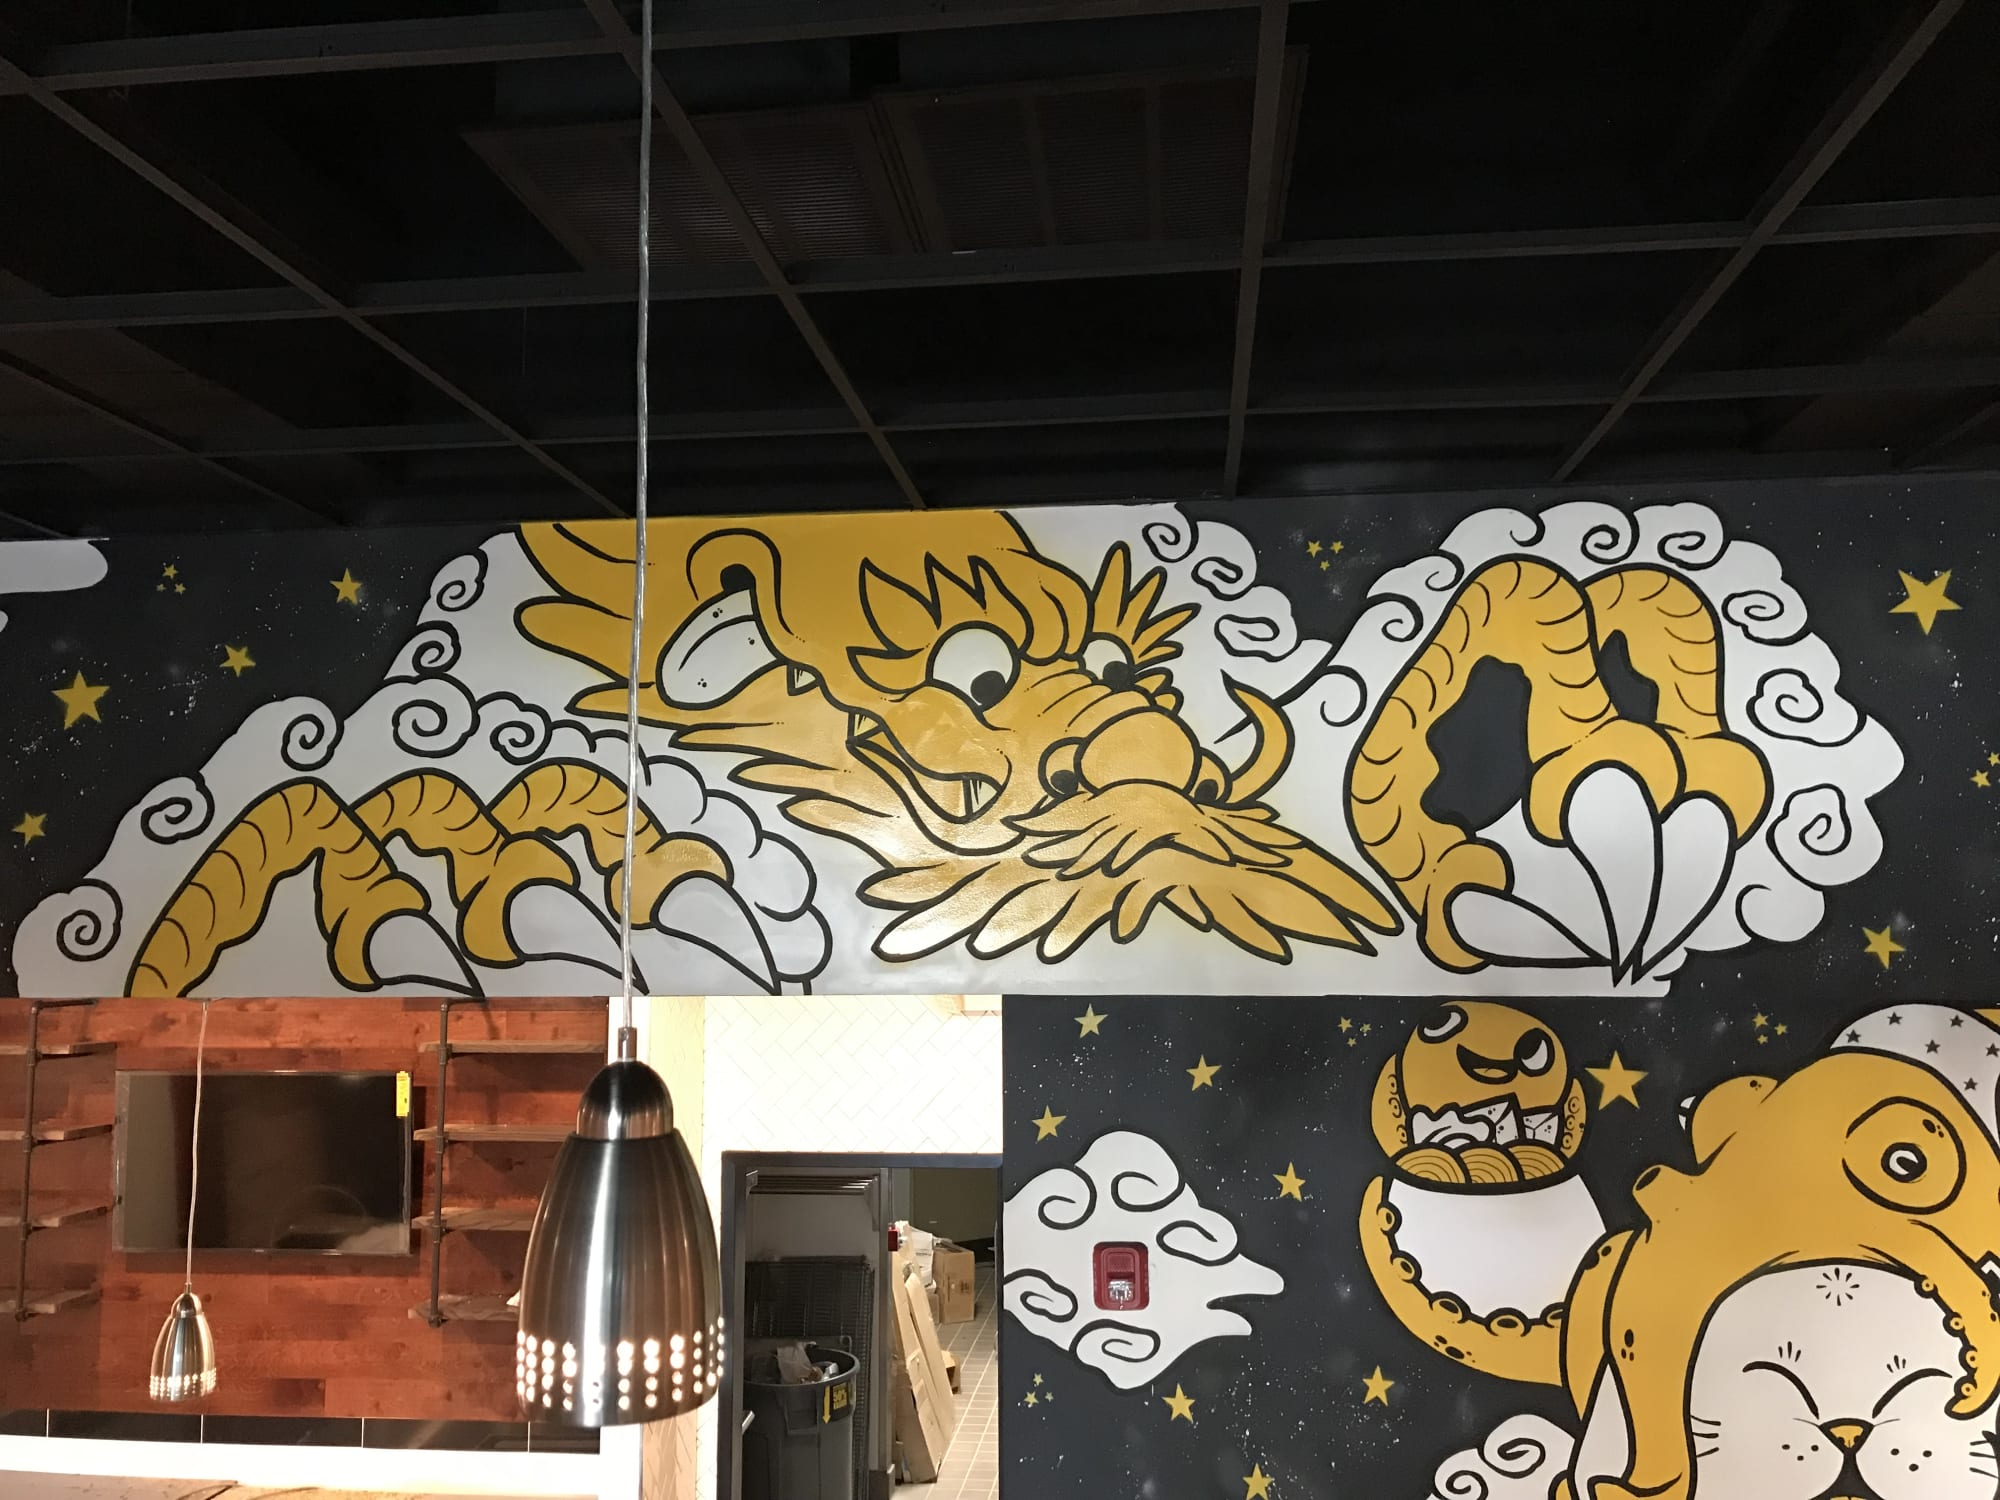 Murals by Golden Rabbit Silent Monkey seen at Little Dipper Hot Pot House, Fairfax - Food Offering for the Heavenly Dragon